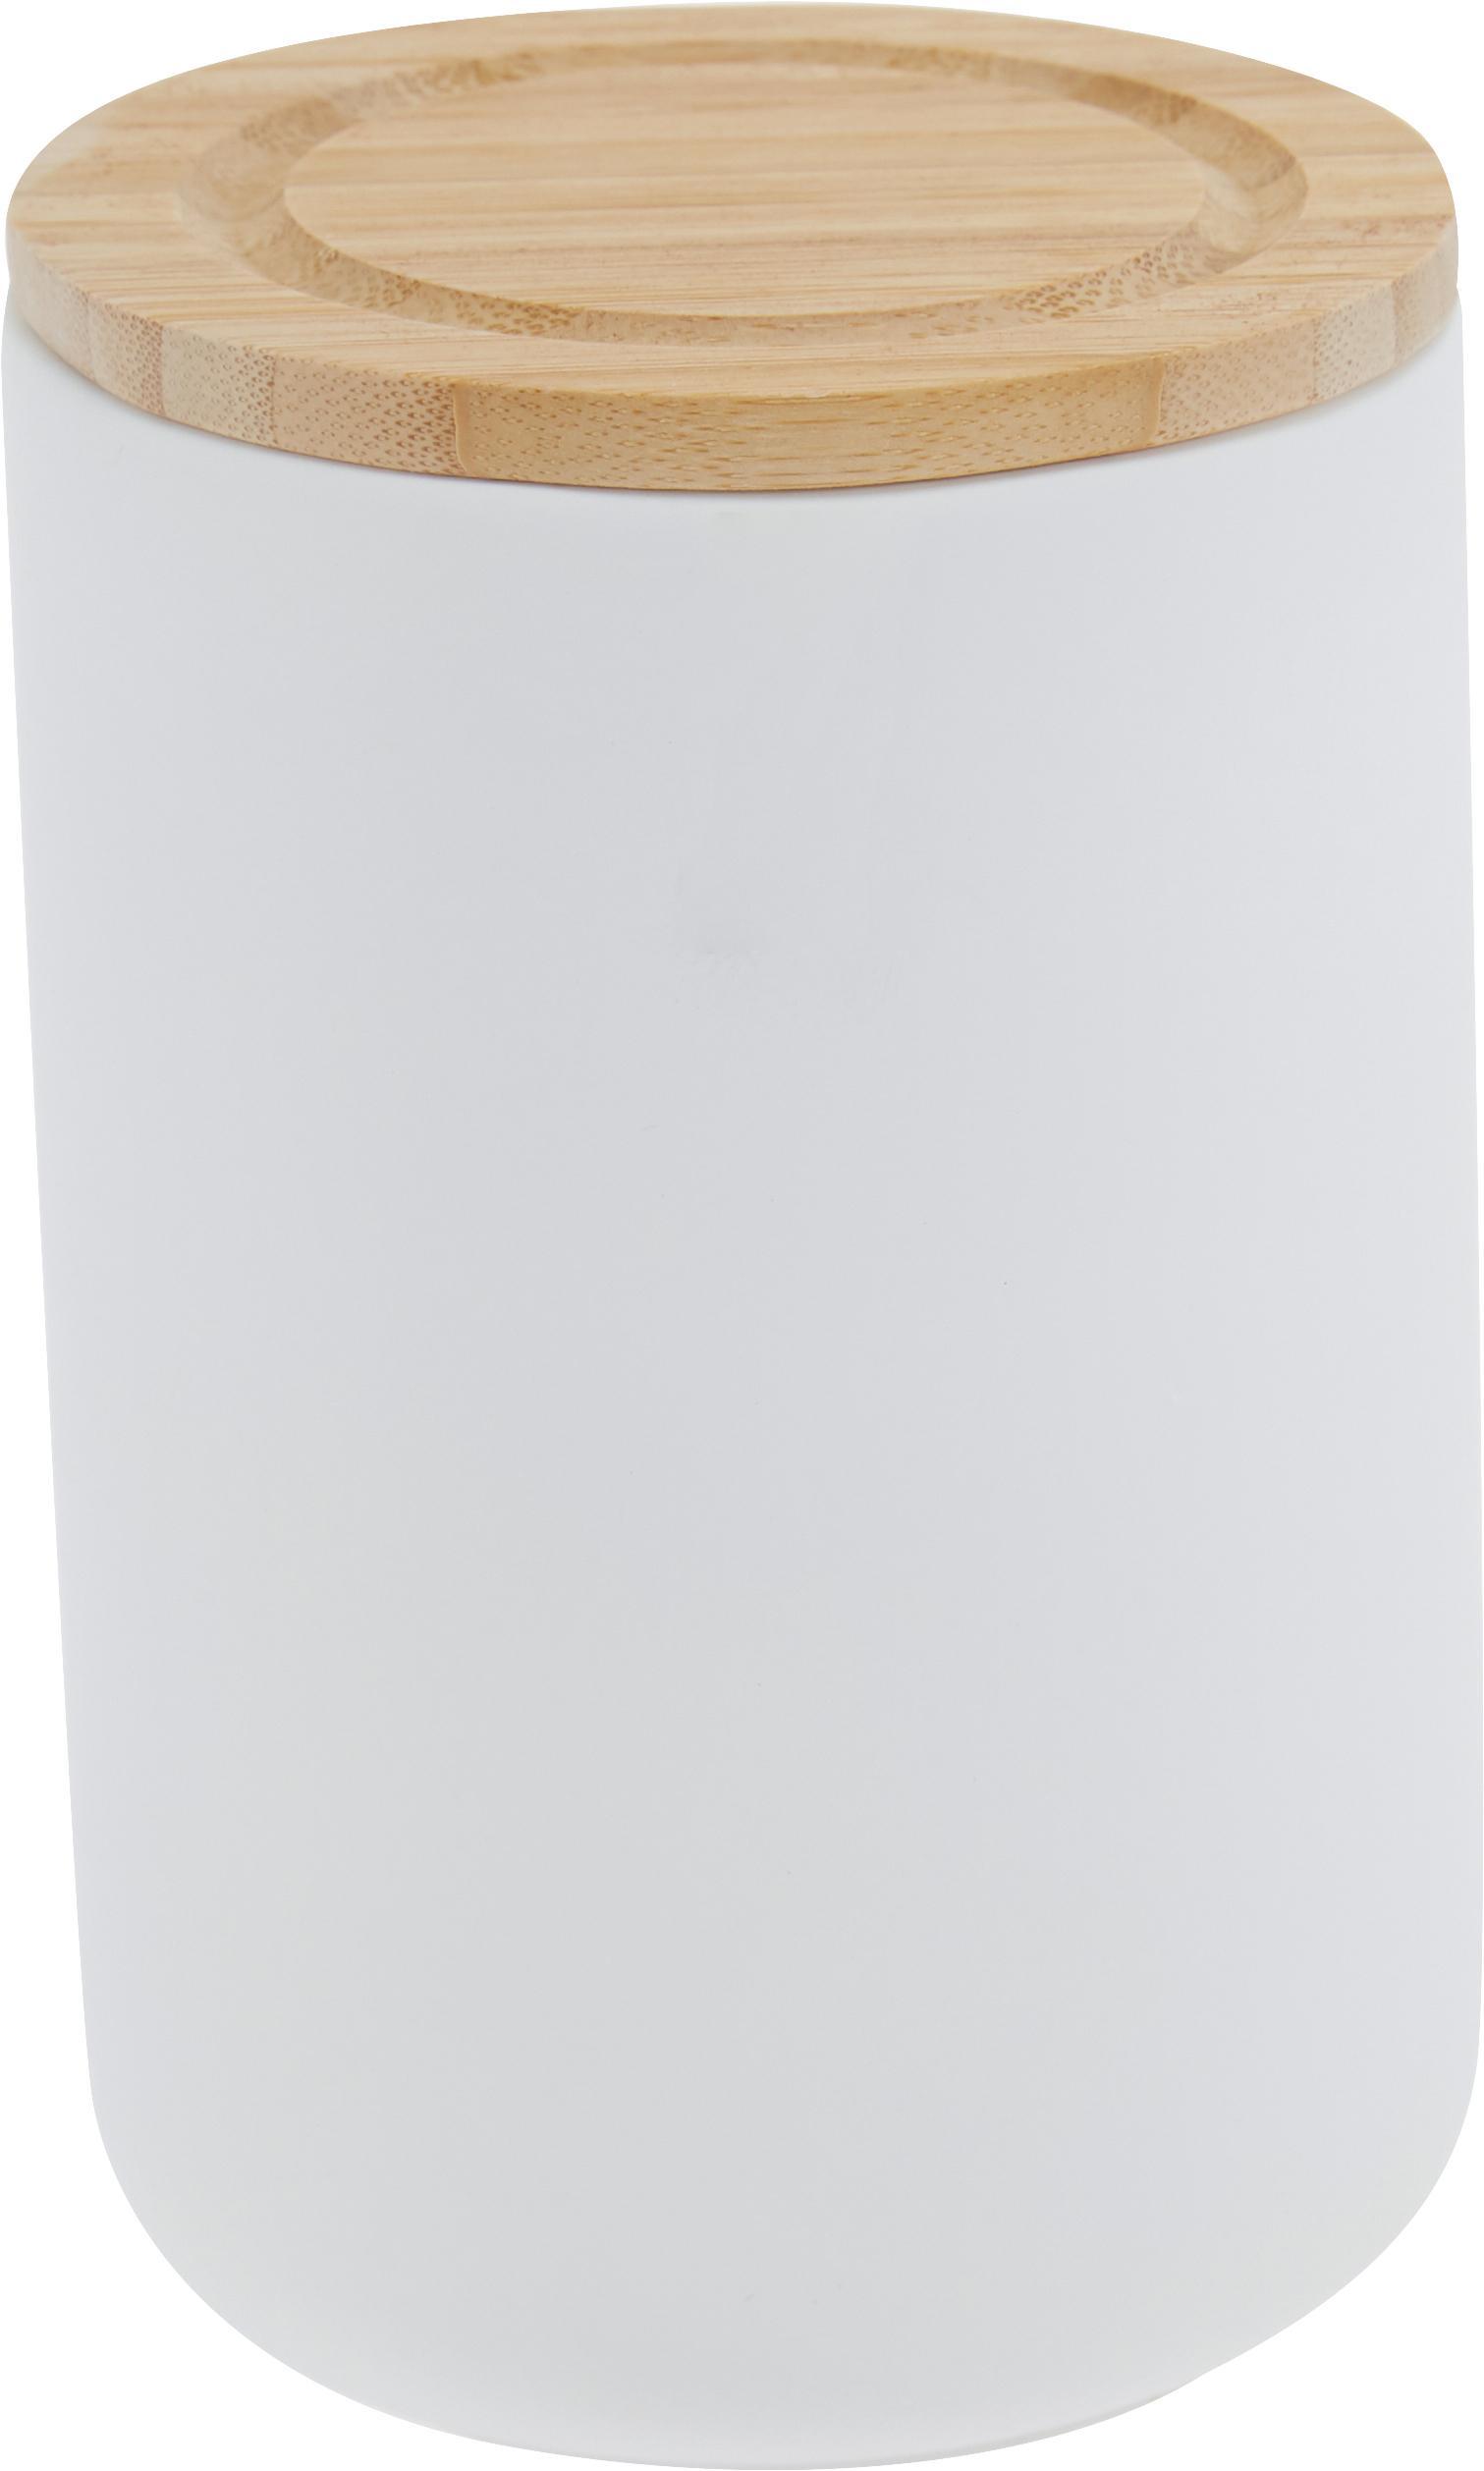 Aufbewahrungsdose Stak, Dose: Keramik, Deckel: Bambusholz, Weiß, Bambus, Ø 10 x H 17 cm